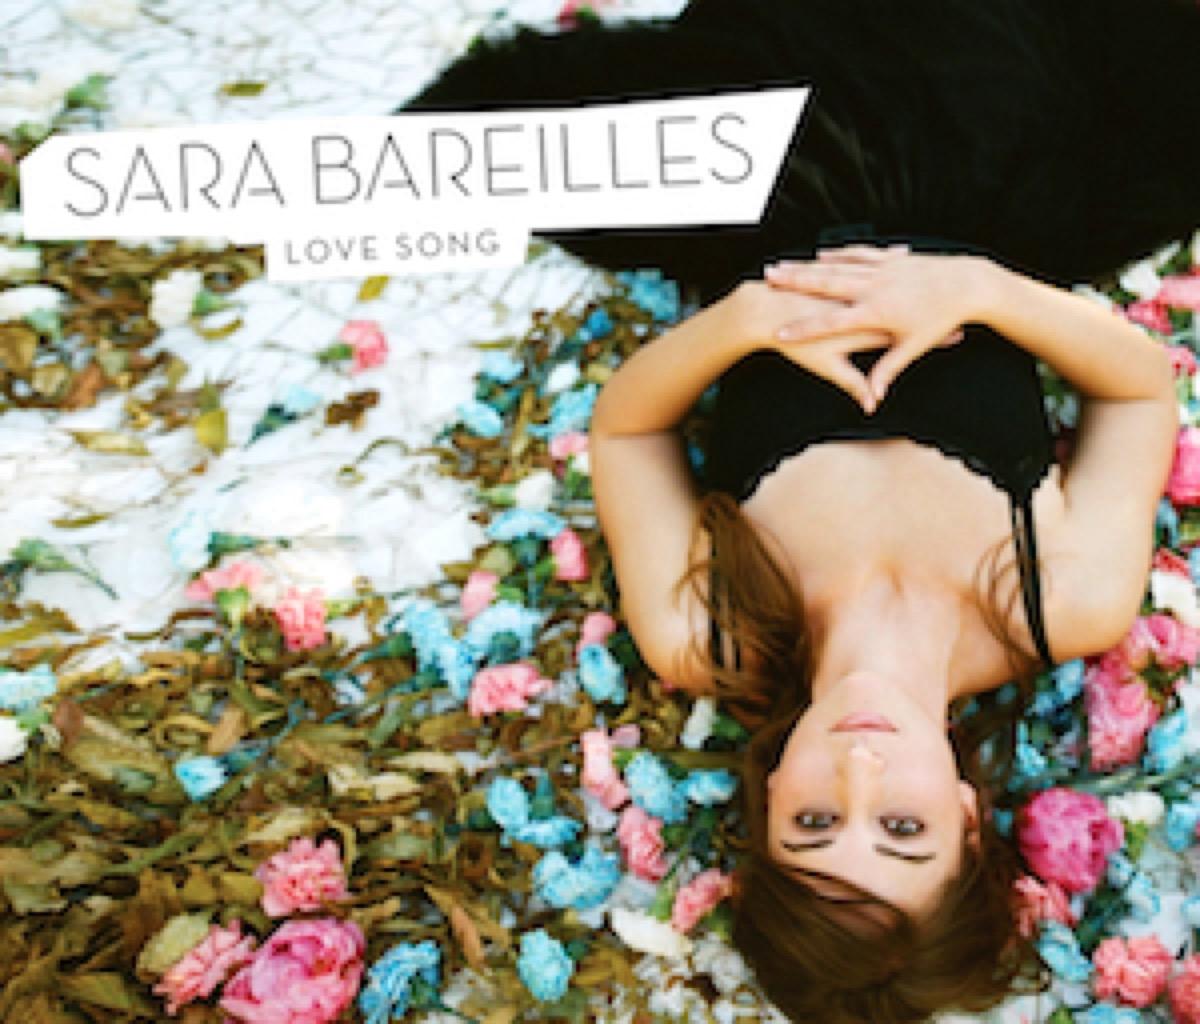 sara bareilles love song cover art